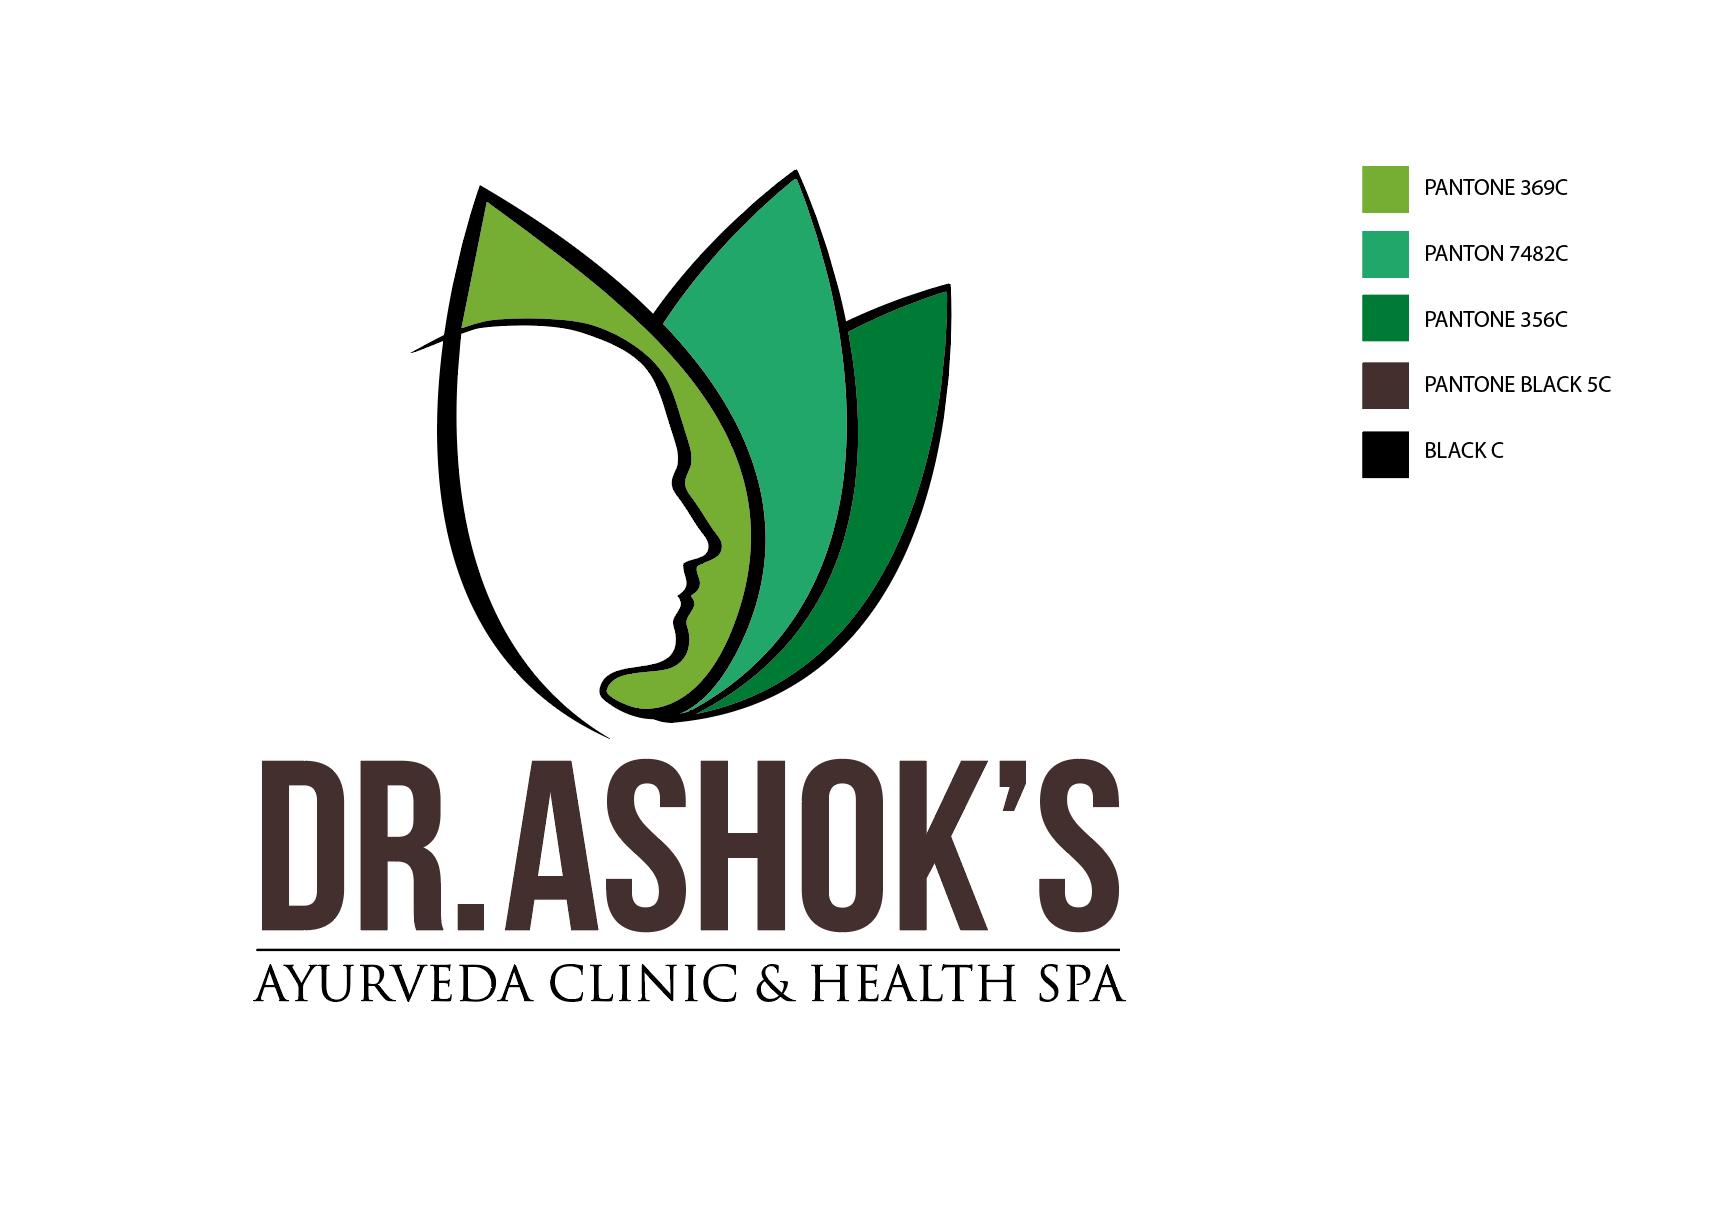 Dr Ashok's